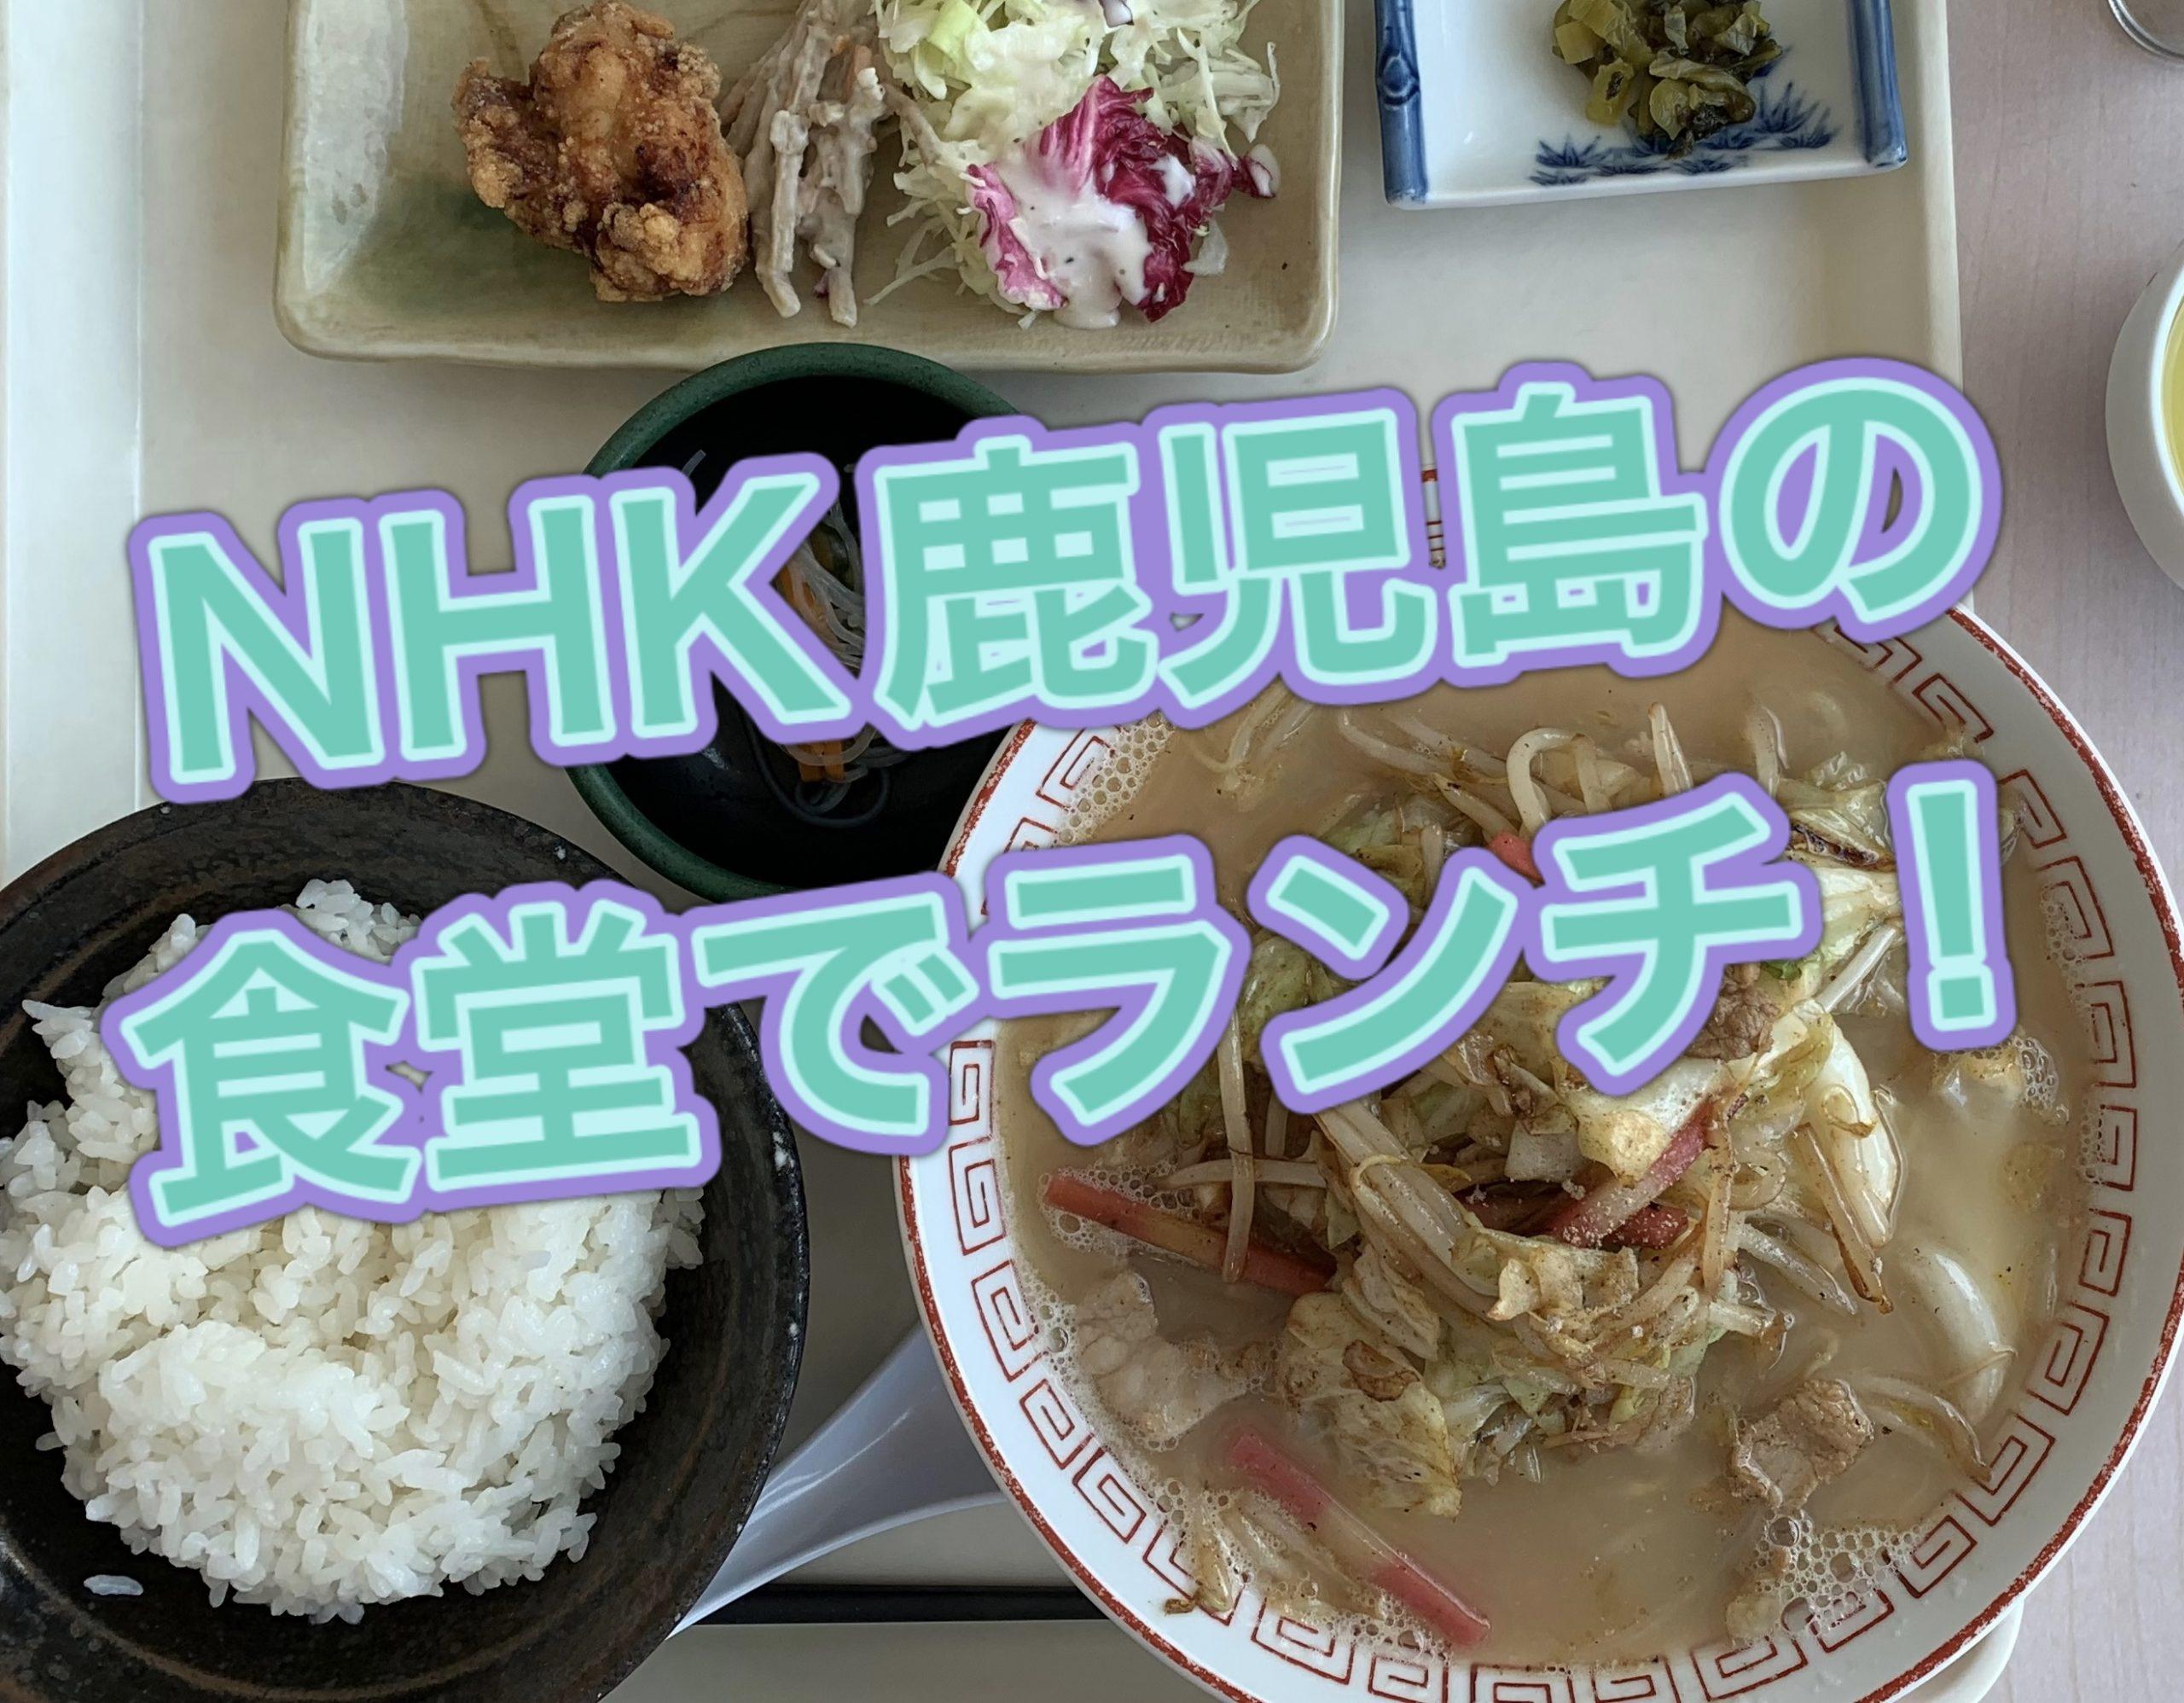 NHK鹿児島でランチ食べてみた!!日替わり定食520円〜 イメージ画像